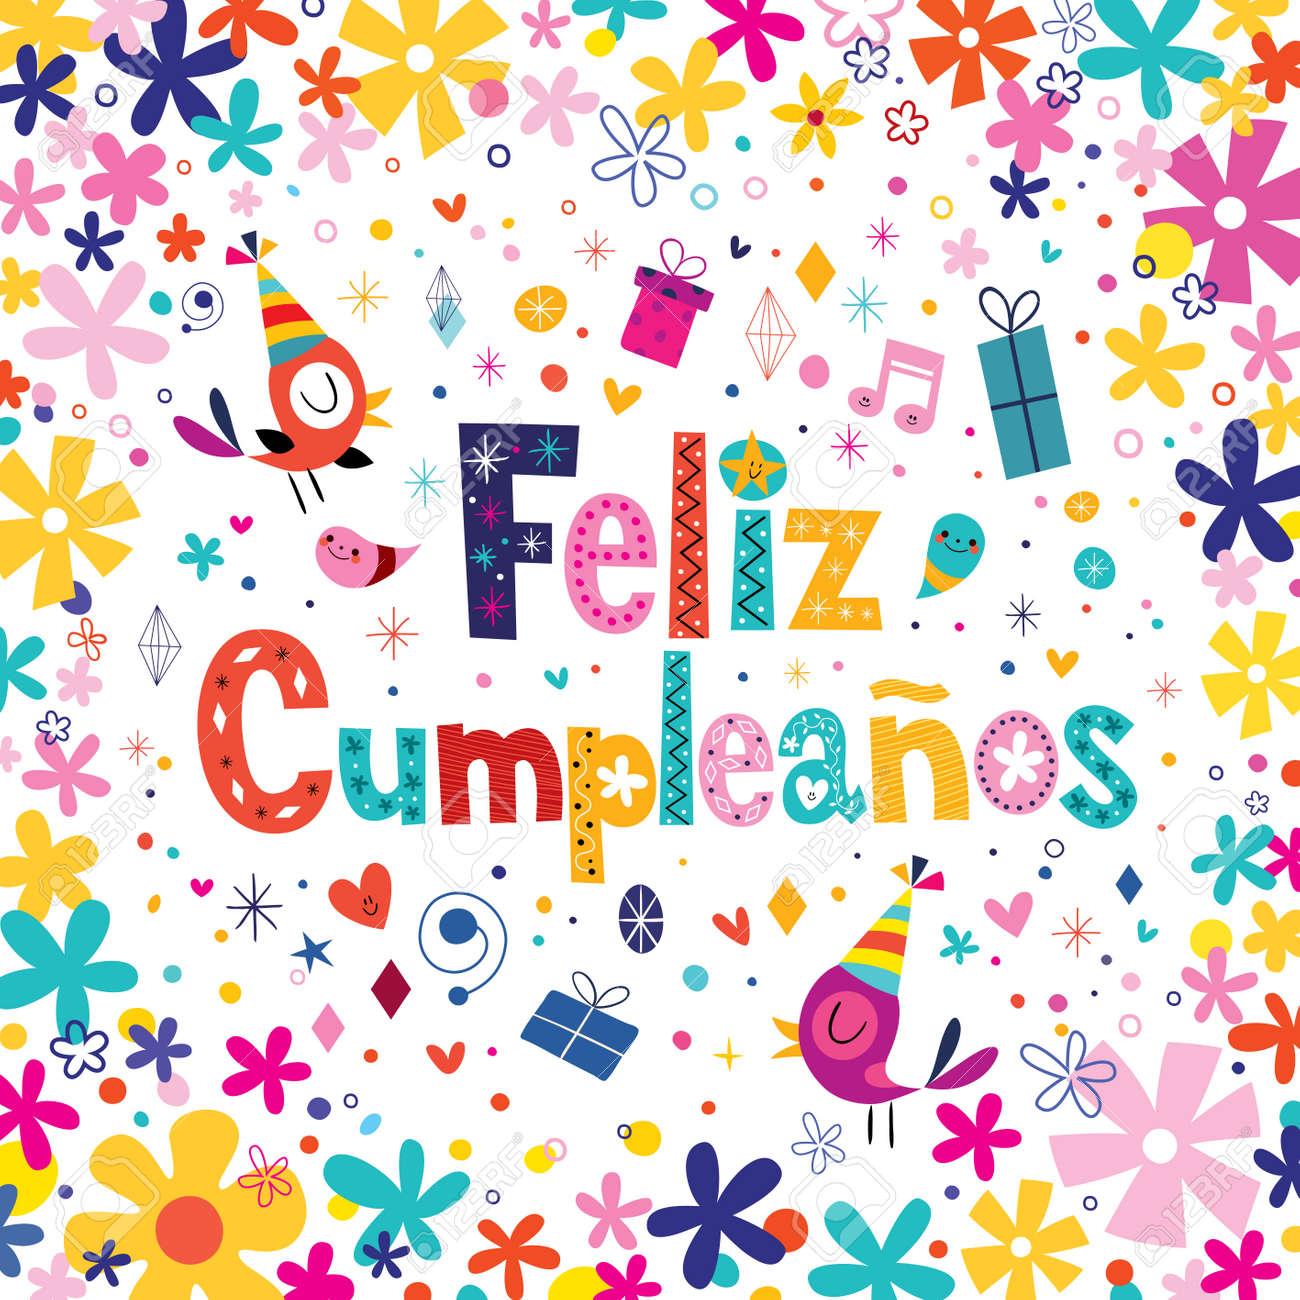 Feliz Cumpleanos Happy Birthday In Spanish Greeting Card Royalty